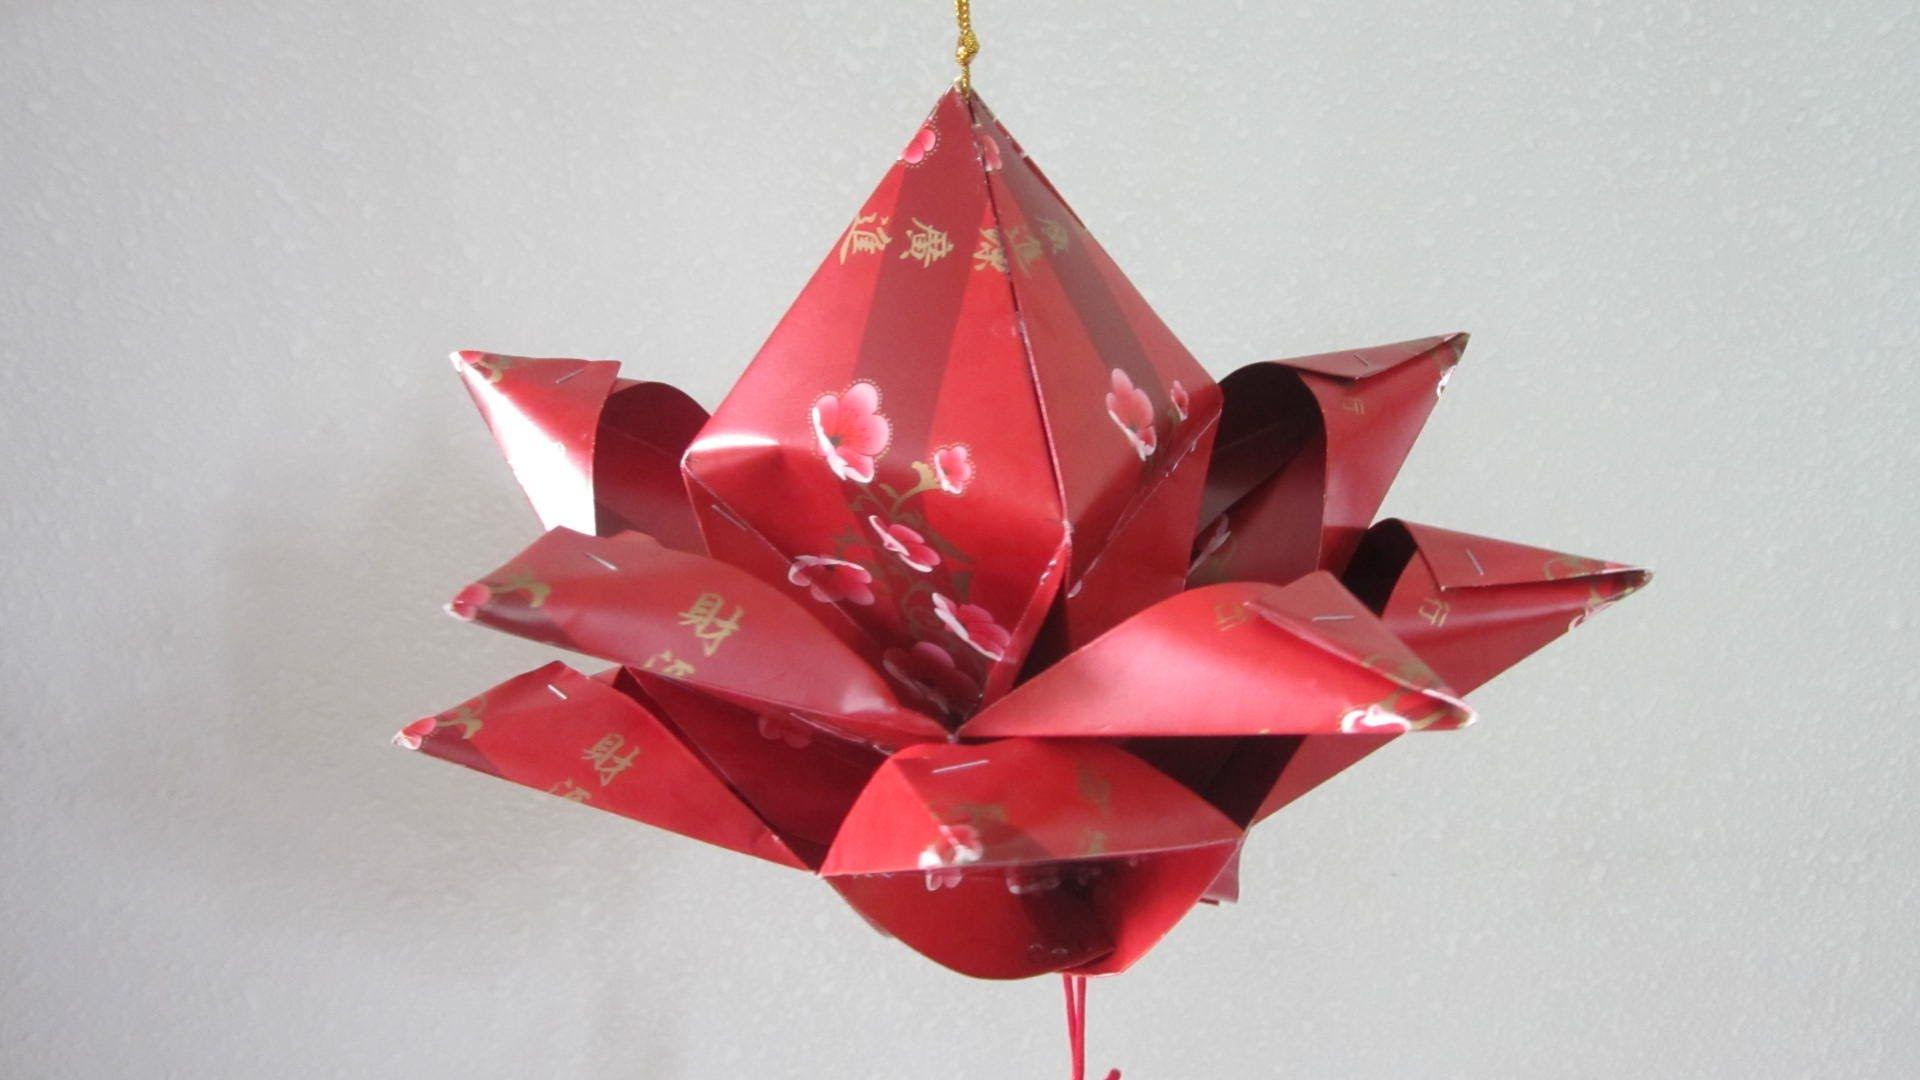 paper crafting video: CNY TUTORIAL NO. 44 - Hongbao Lotus ...